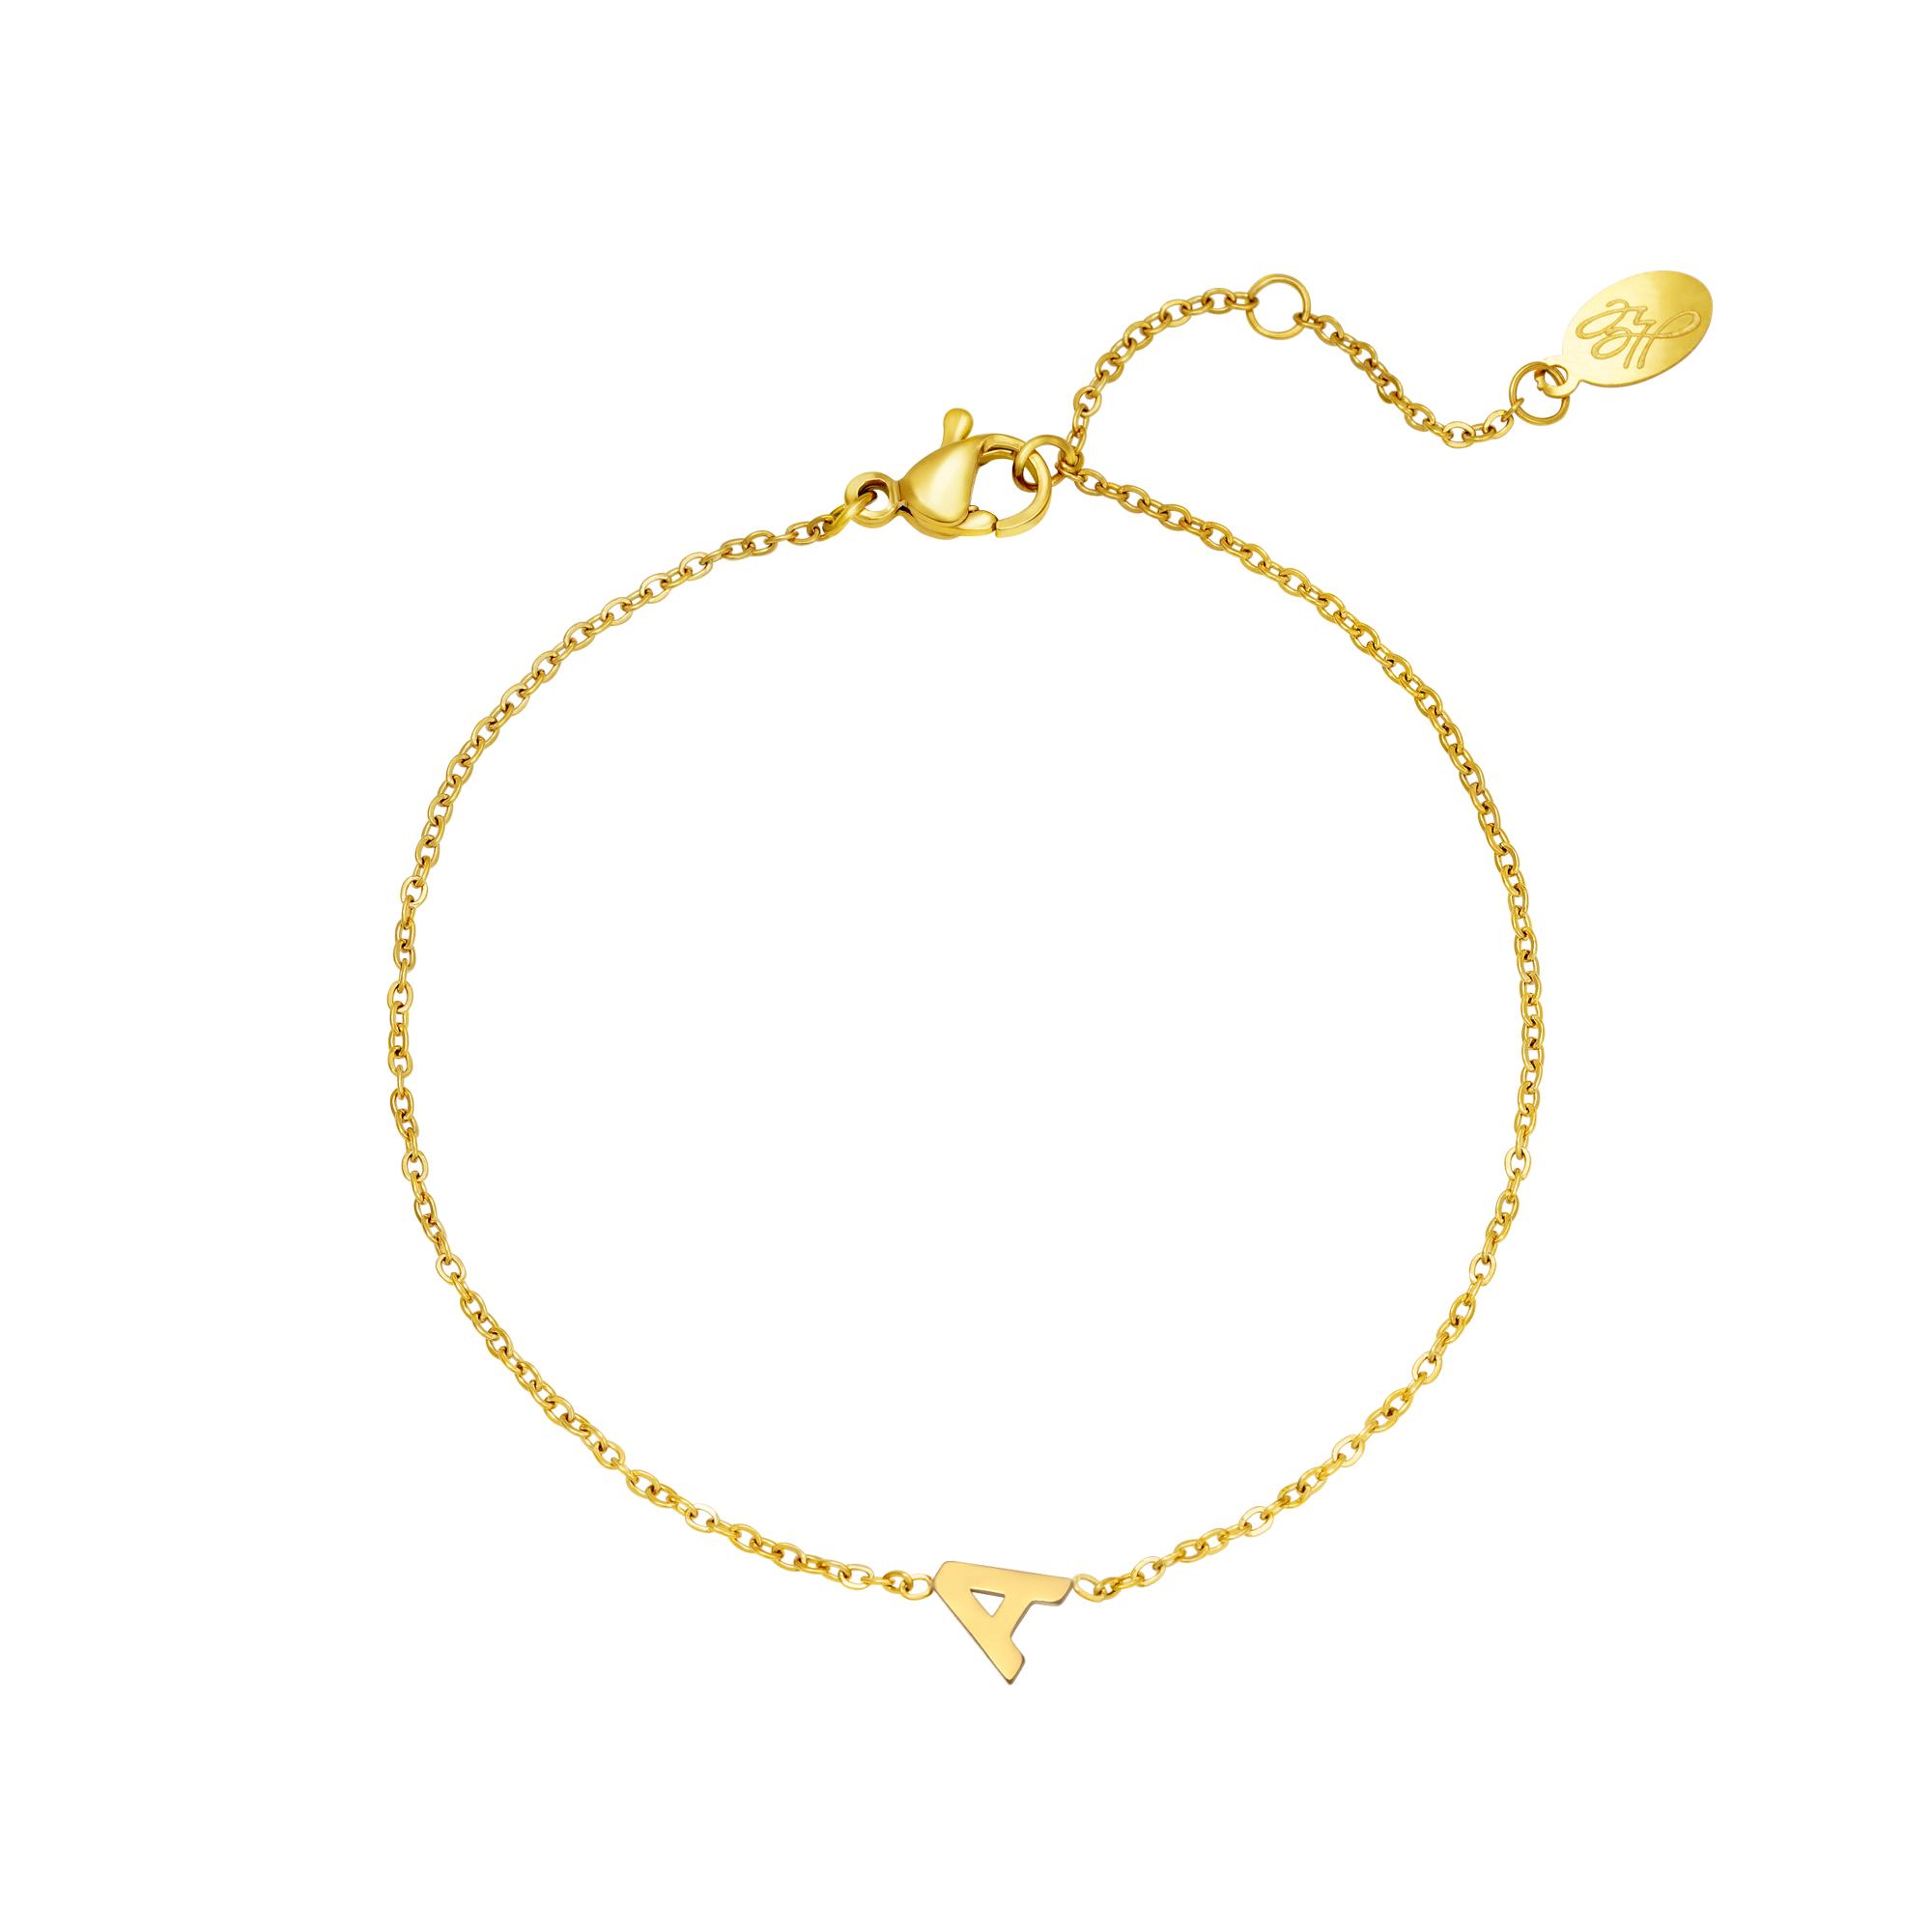 Bracelet en acier inoxydable initiale S